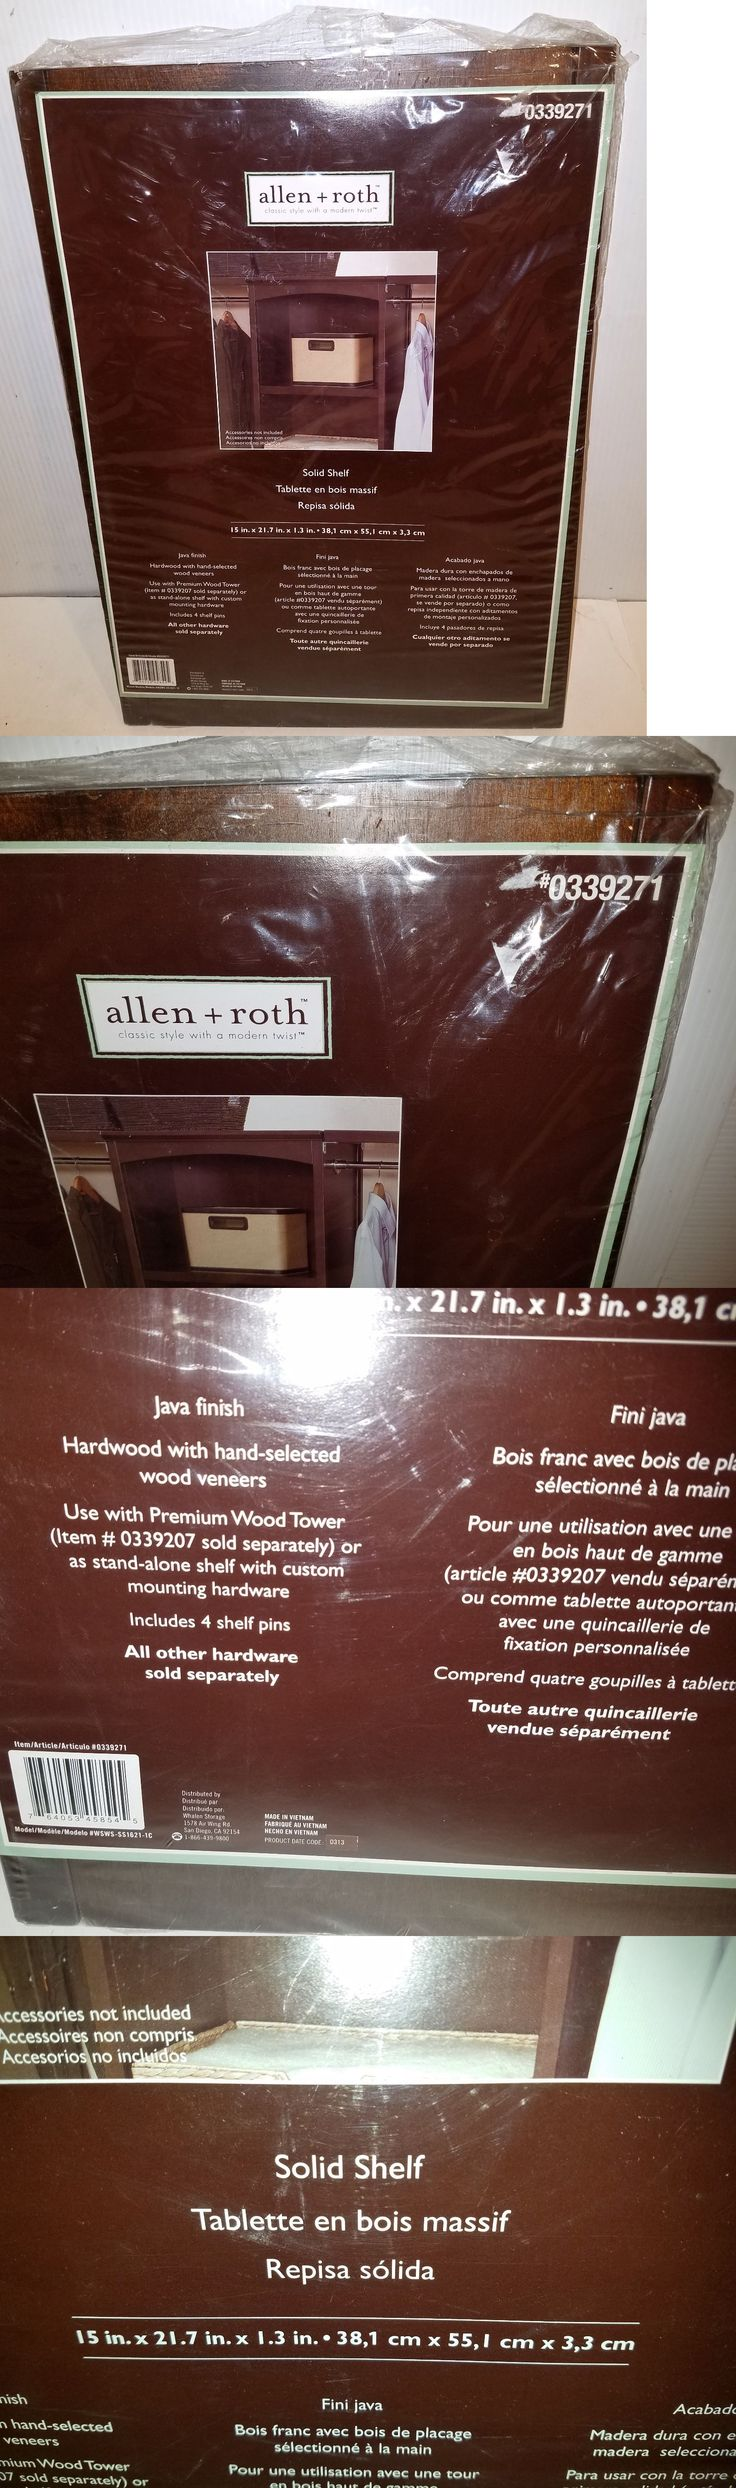 Closet Organizers 43503: Allen+Roth(Java Finish)Closet Hardwood Solid Shelf (15 X 21.7 X 1.3 ) #0339271 -> BUY IT NOW ONLY: $79.99 on eBay!